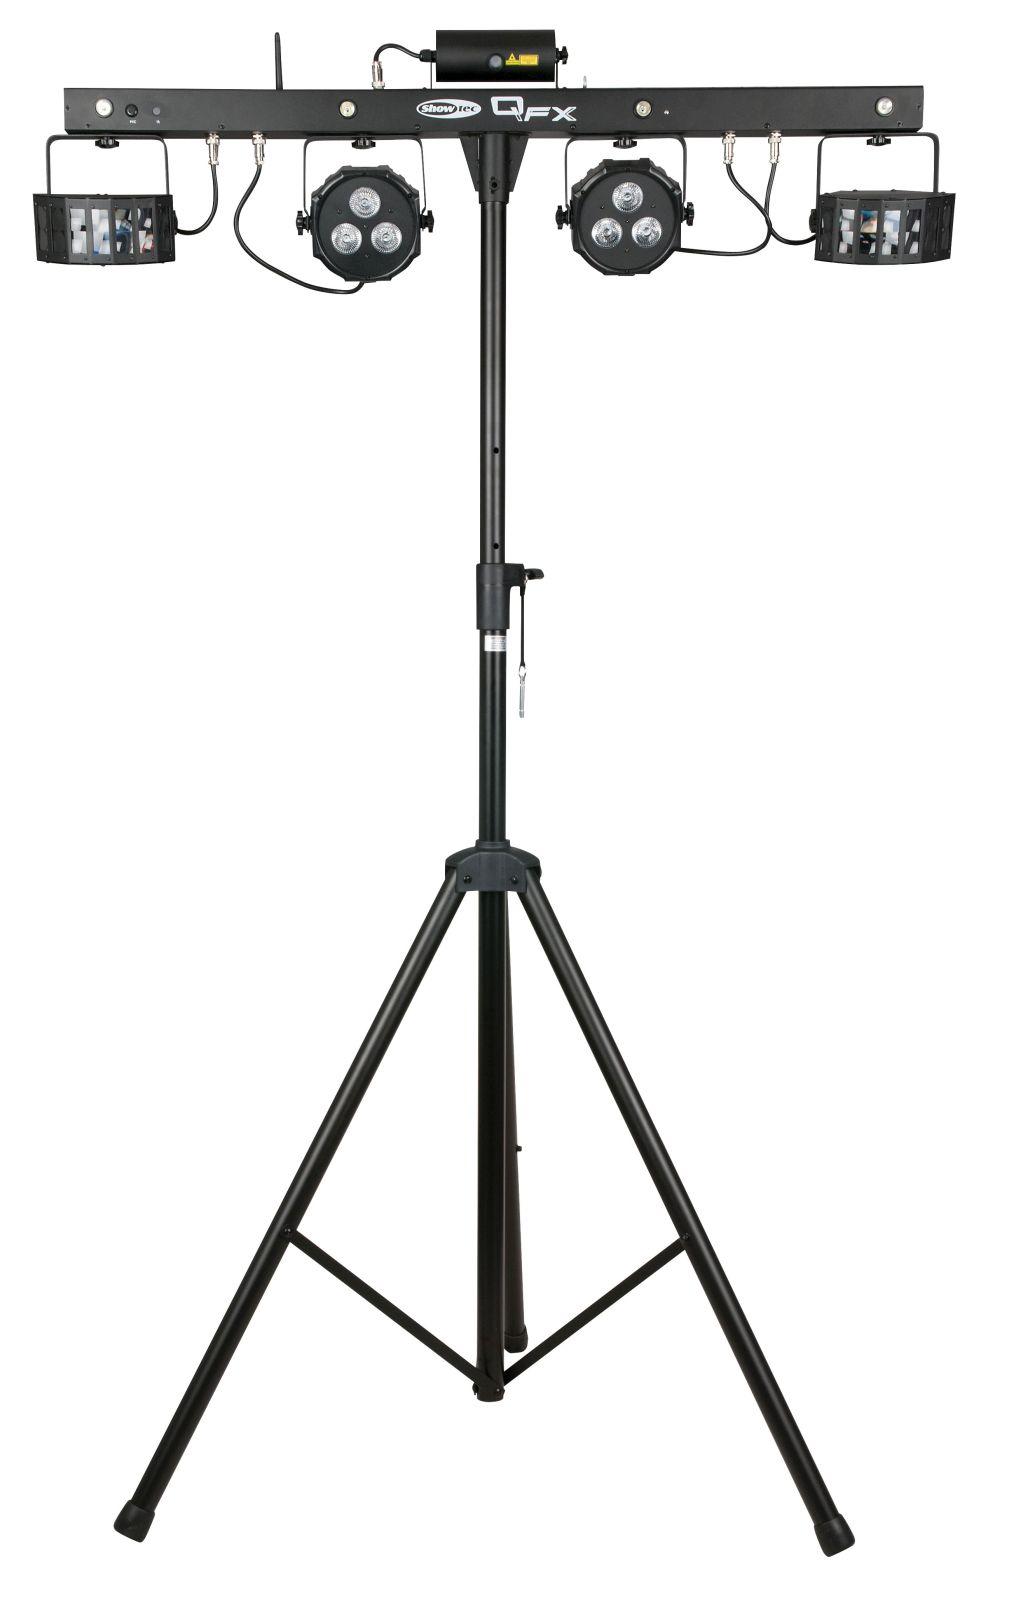 showtec qfx multi fx compact light set. Black Bedroom Furniture Sets. Home Design Ideas